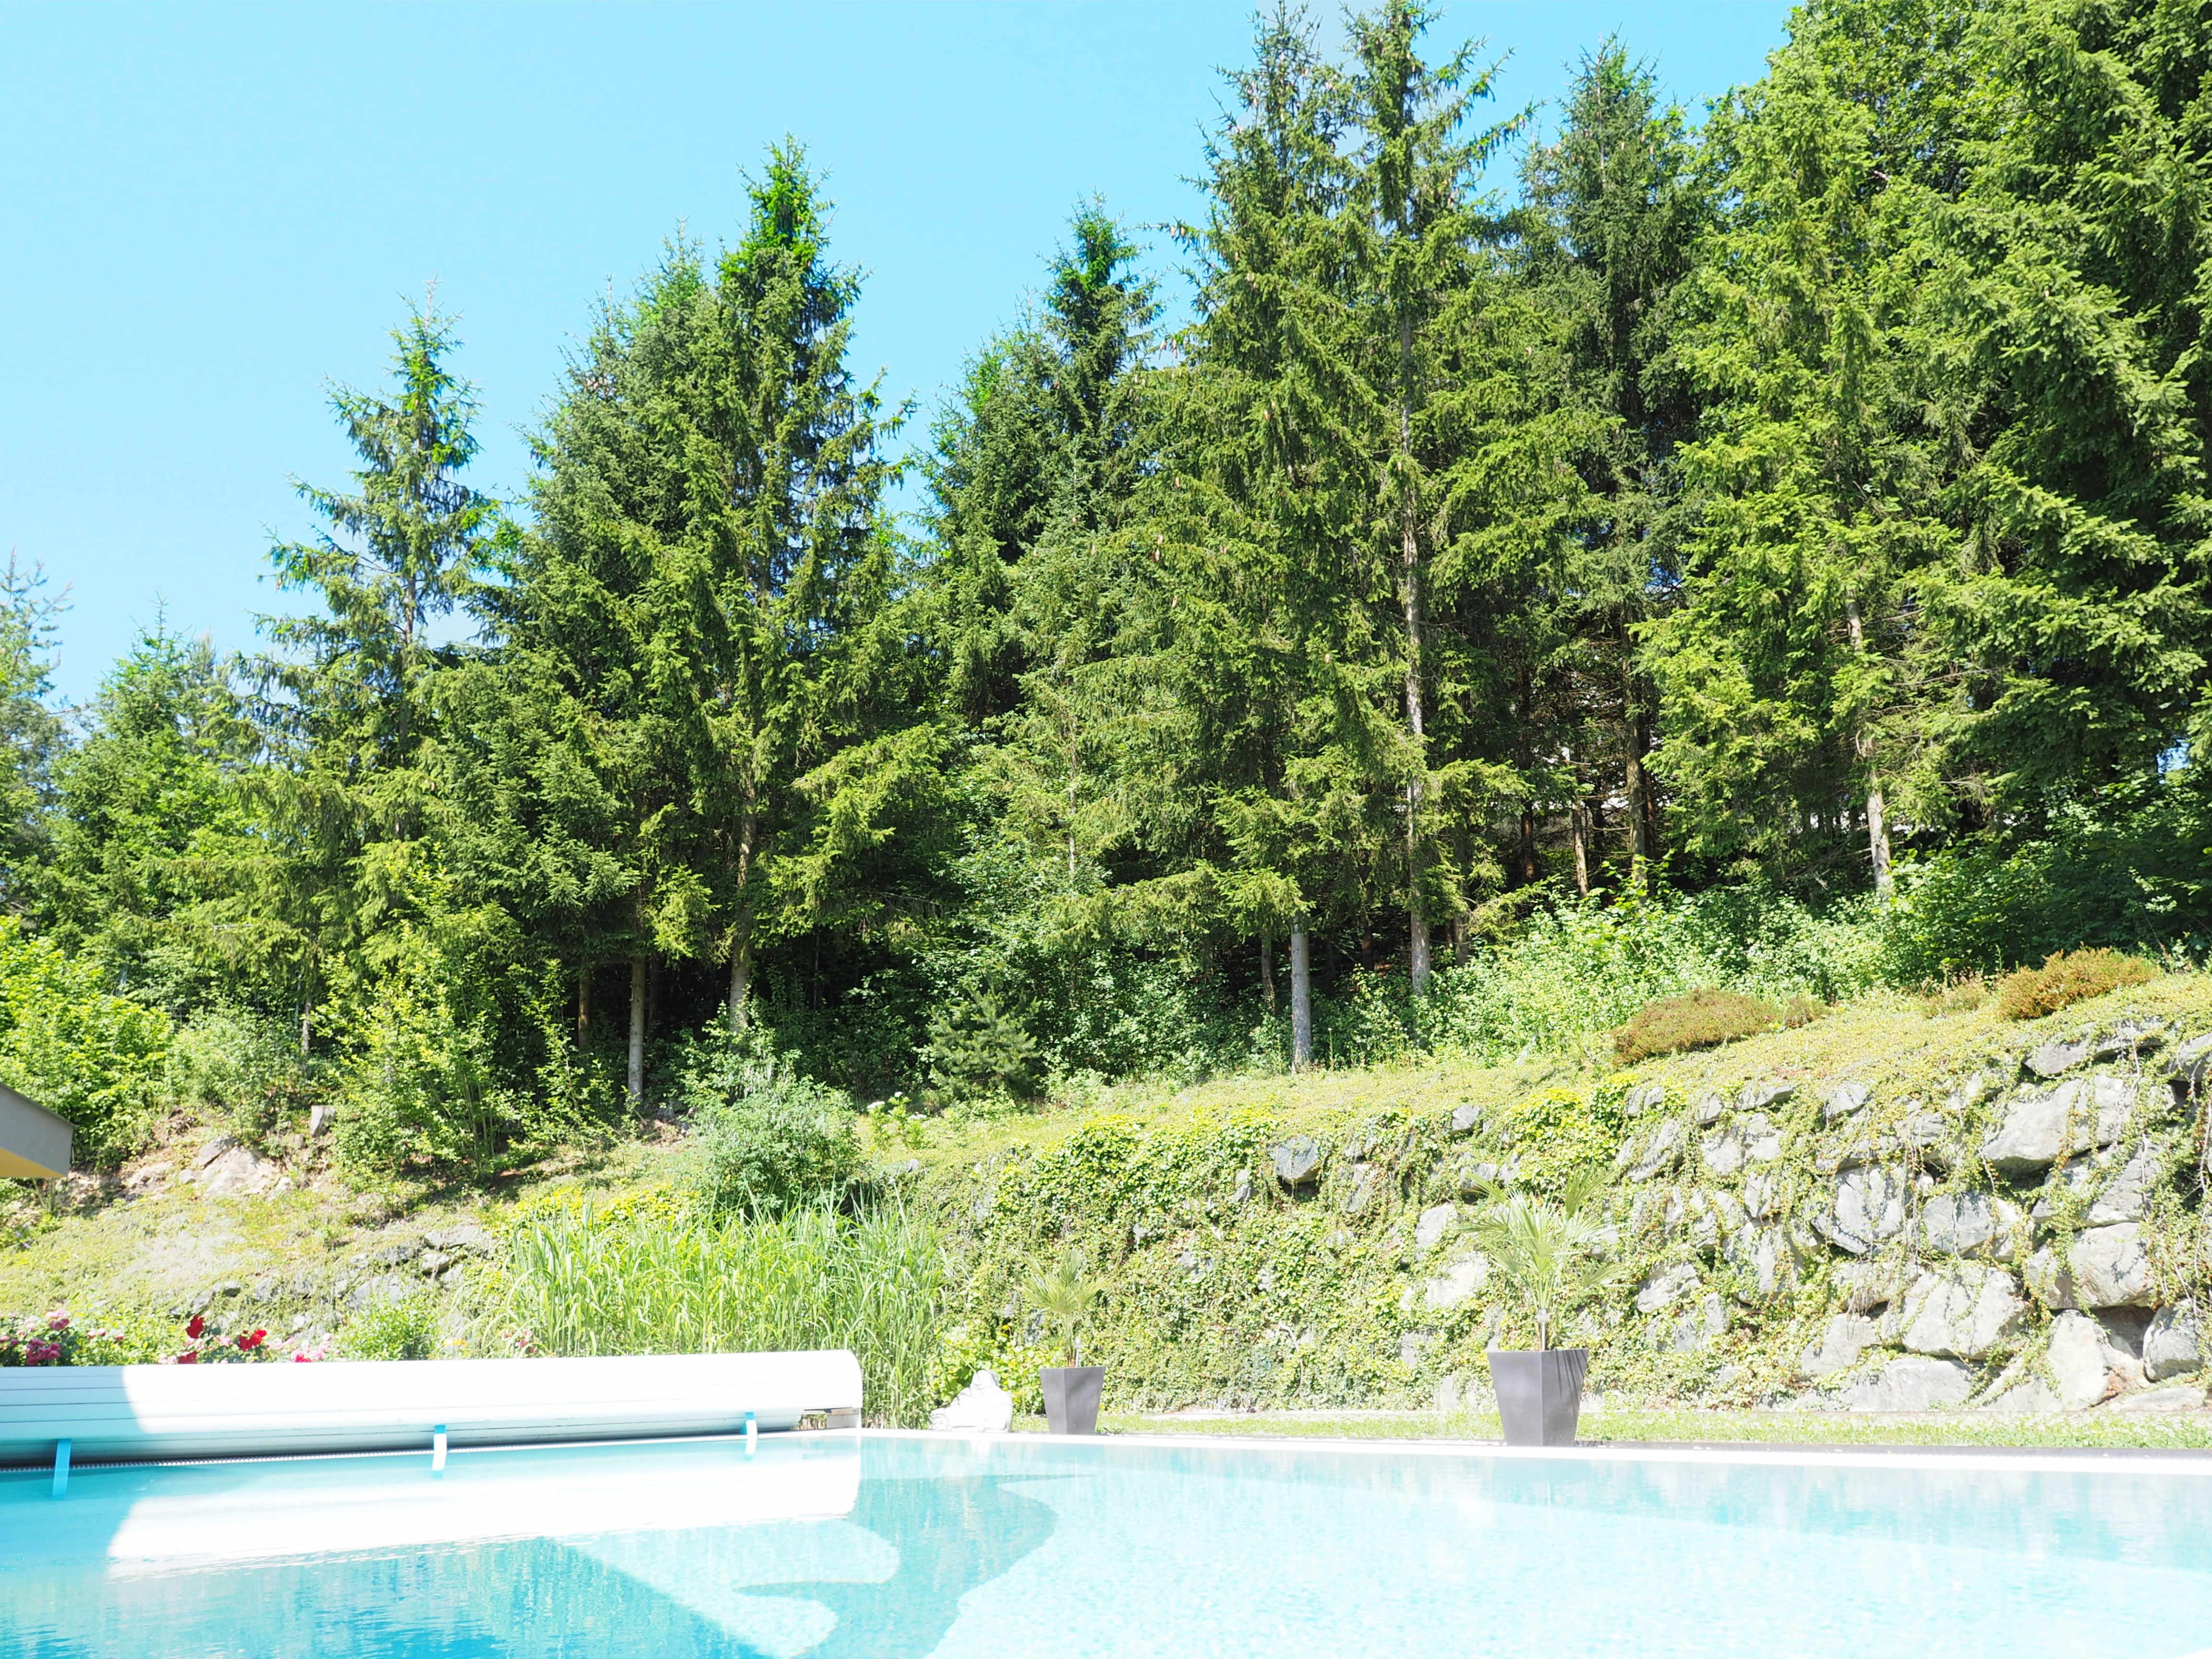 Swimmingpool und Wald